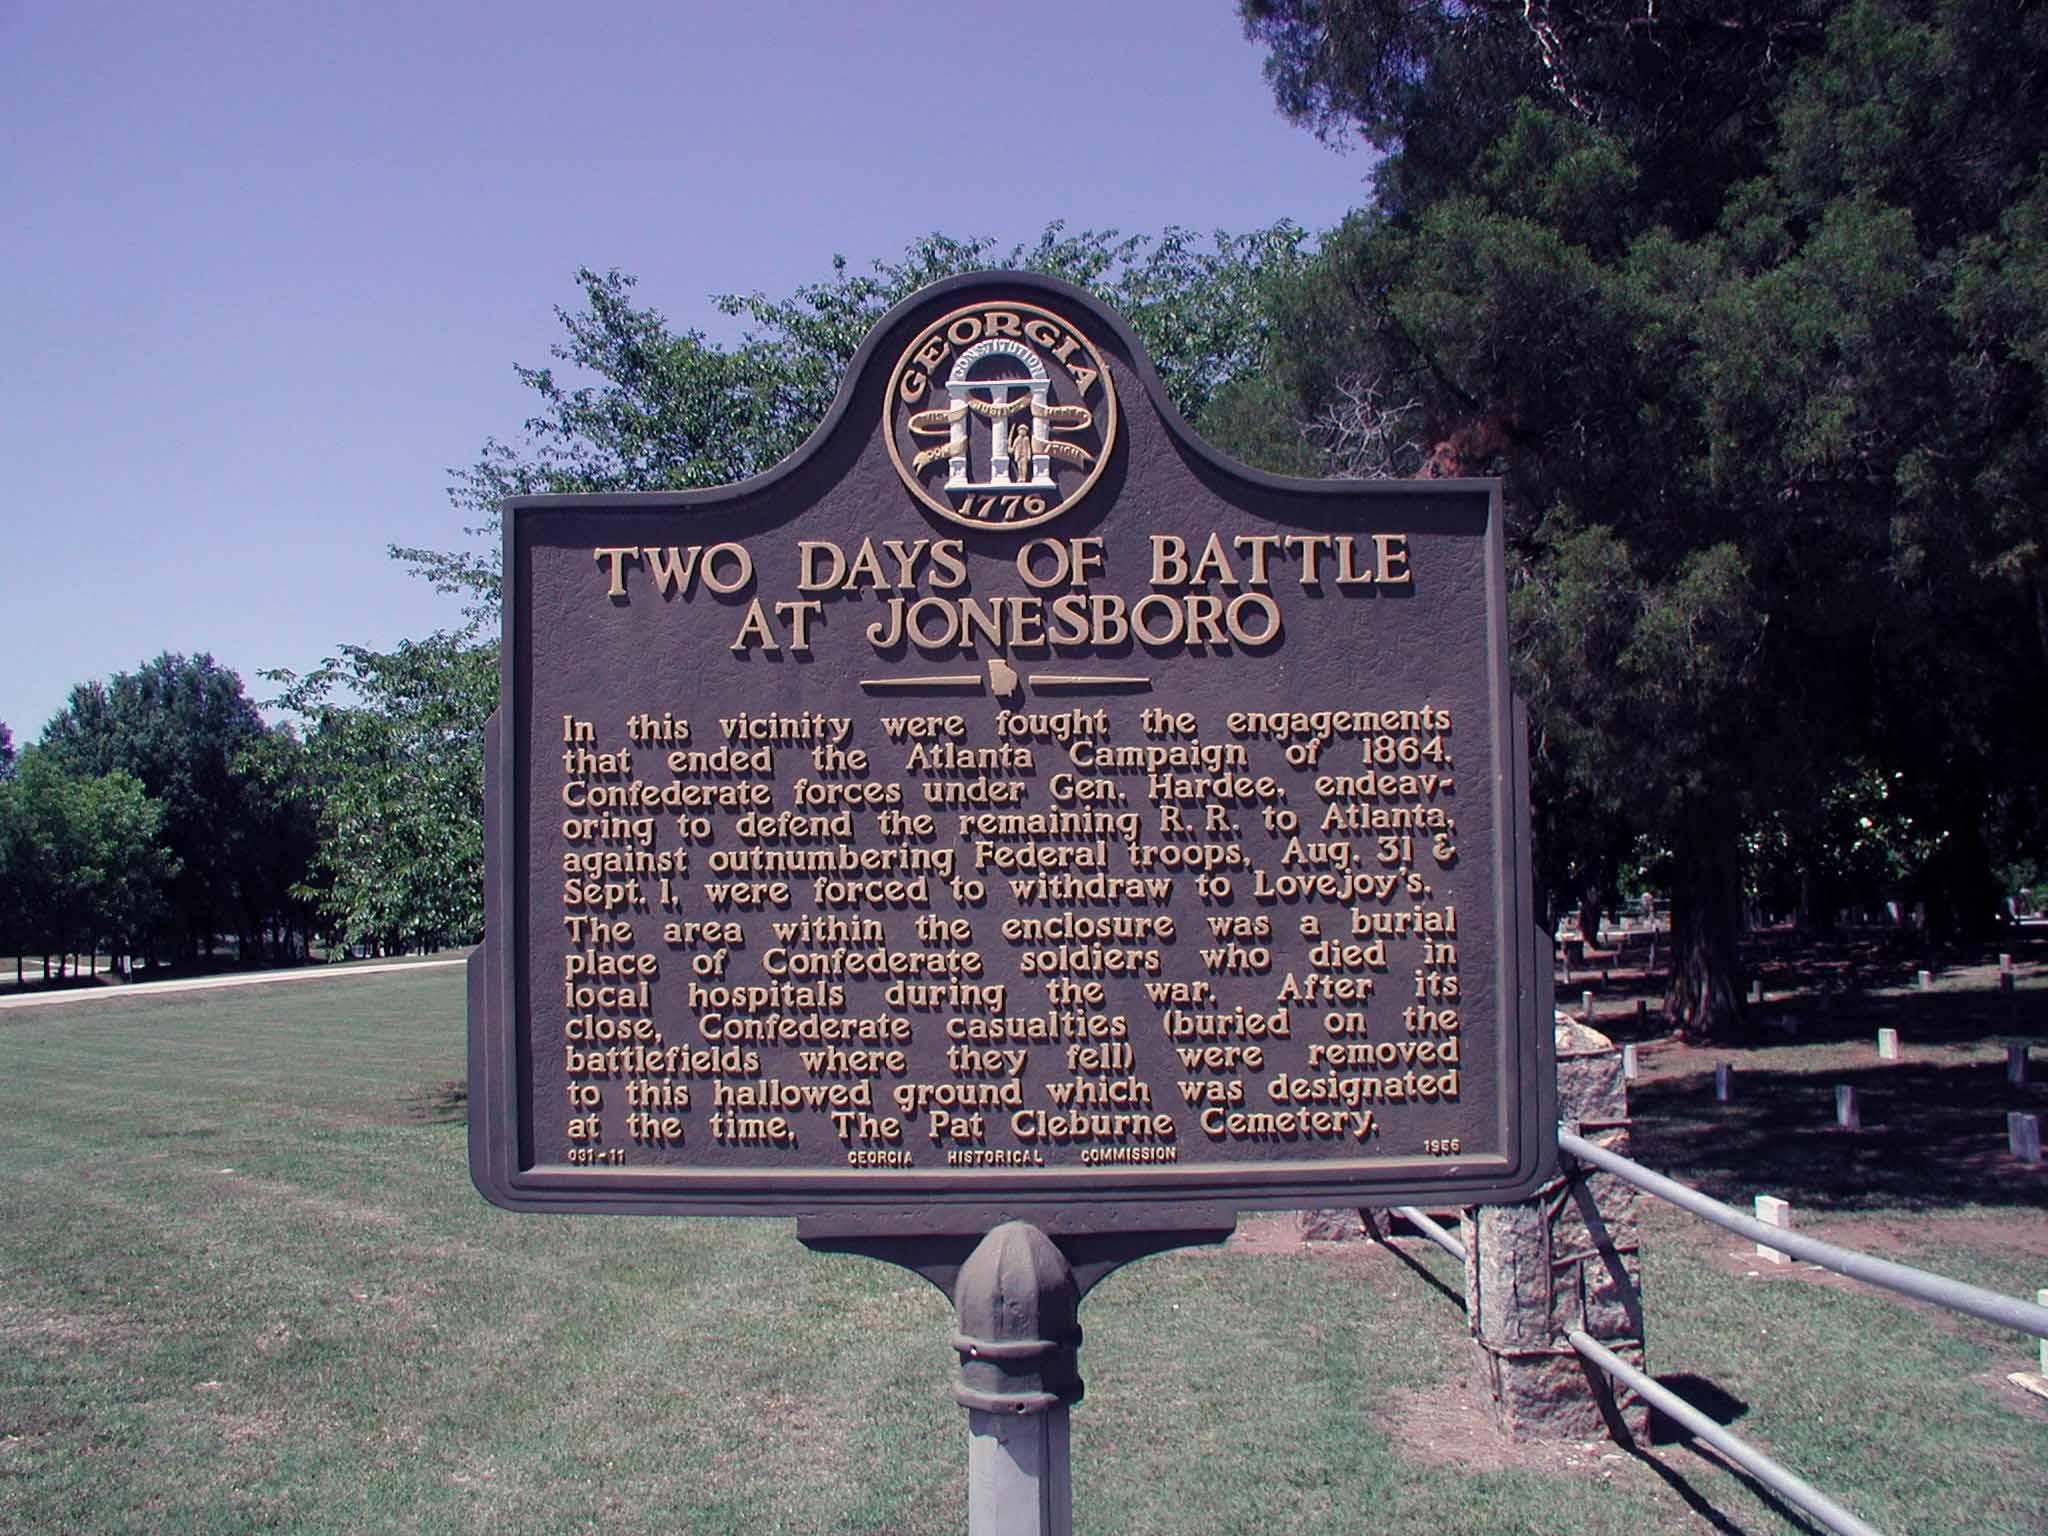 Historical Marker Signifying the Battle of Jonesboro